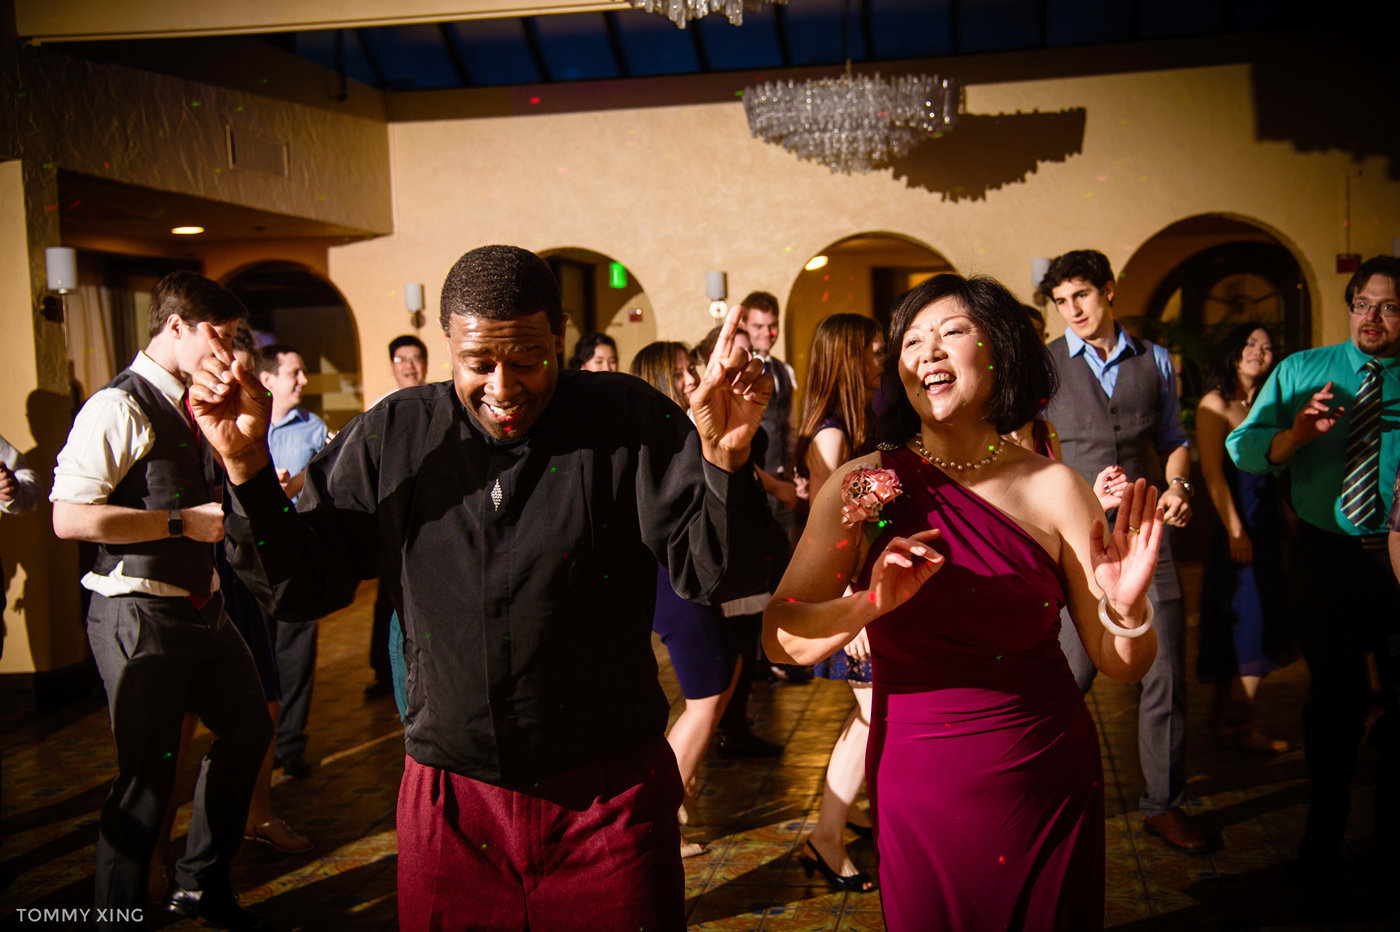 STANFORD MEMORIAL CHURCH WEDDING - Wenjie & Chengcheng - SAN FRANCISCO BAY AREA 斯坦福教堂婚礼跟拍 - 洛杉矶婚礼婚纱照摄影师 Tommy Xing Photography285.jpg